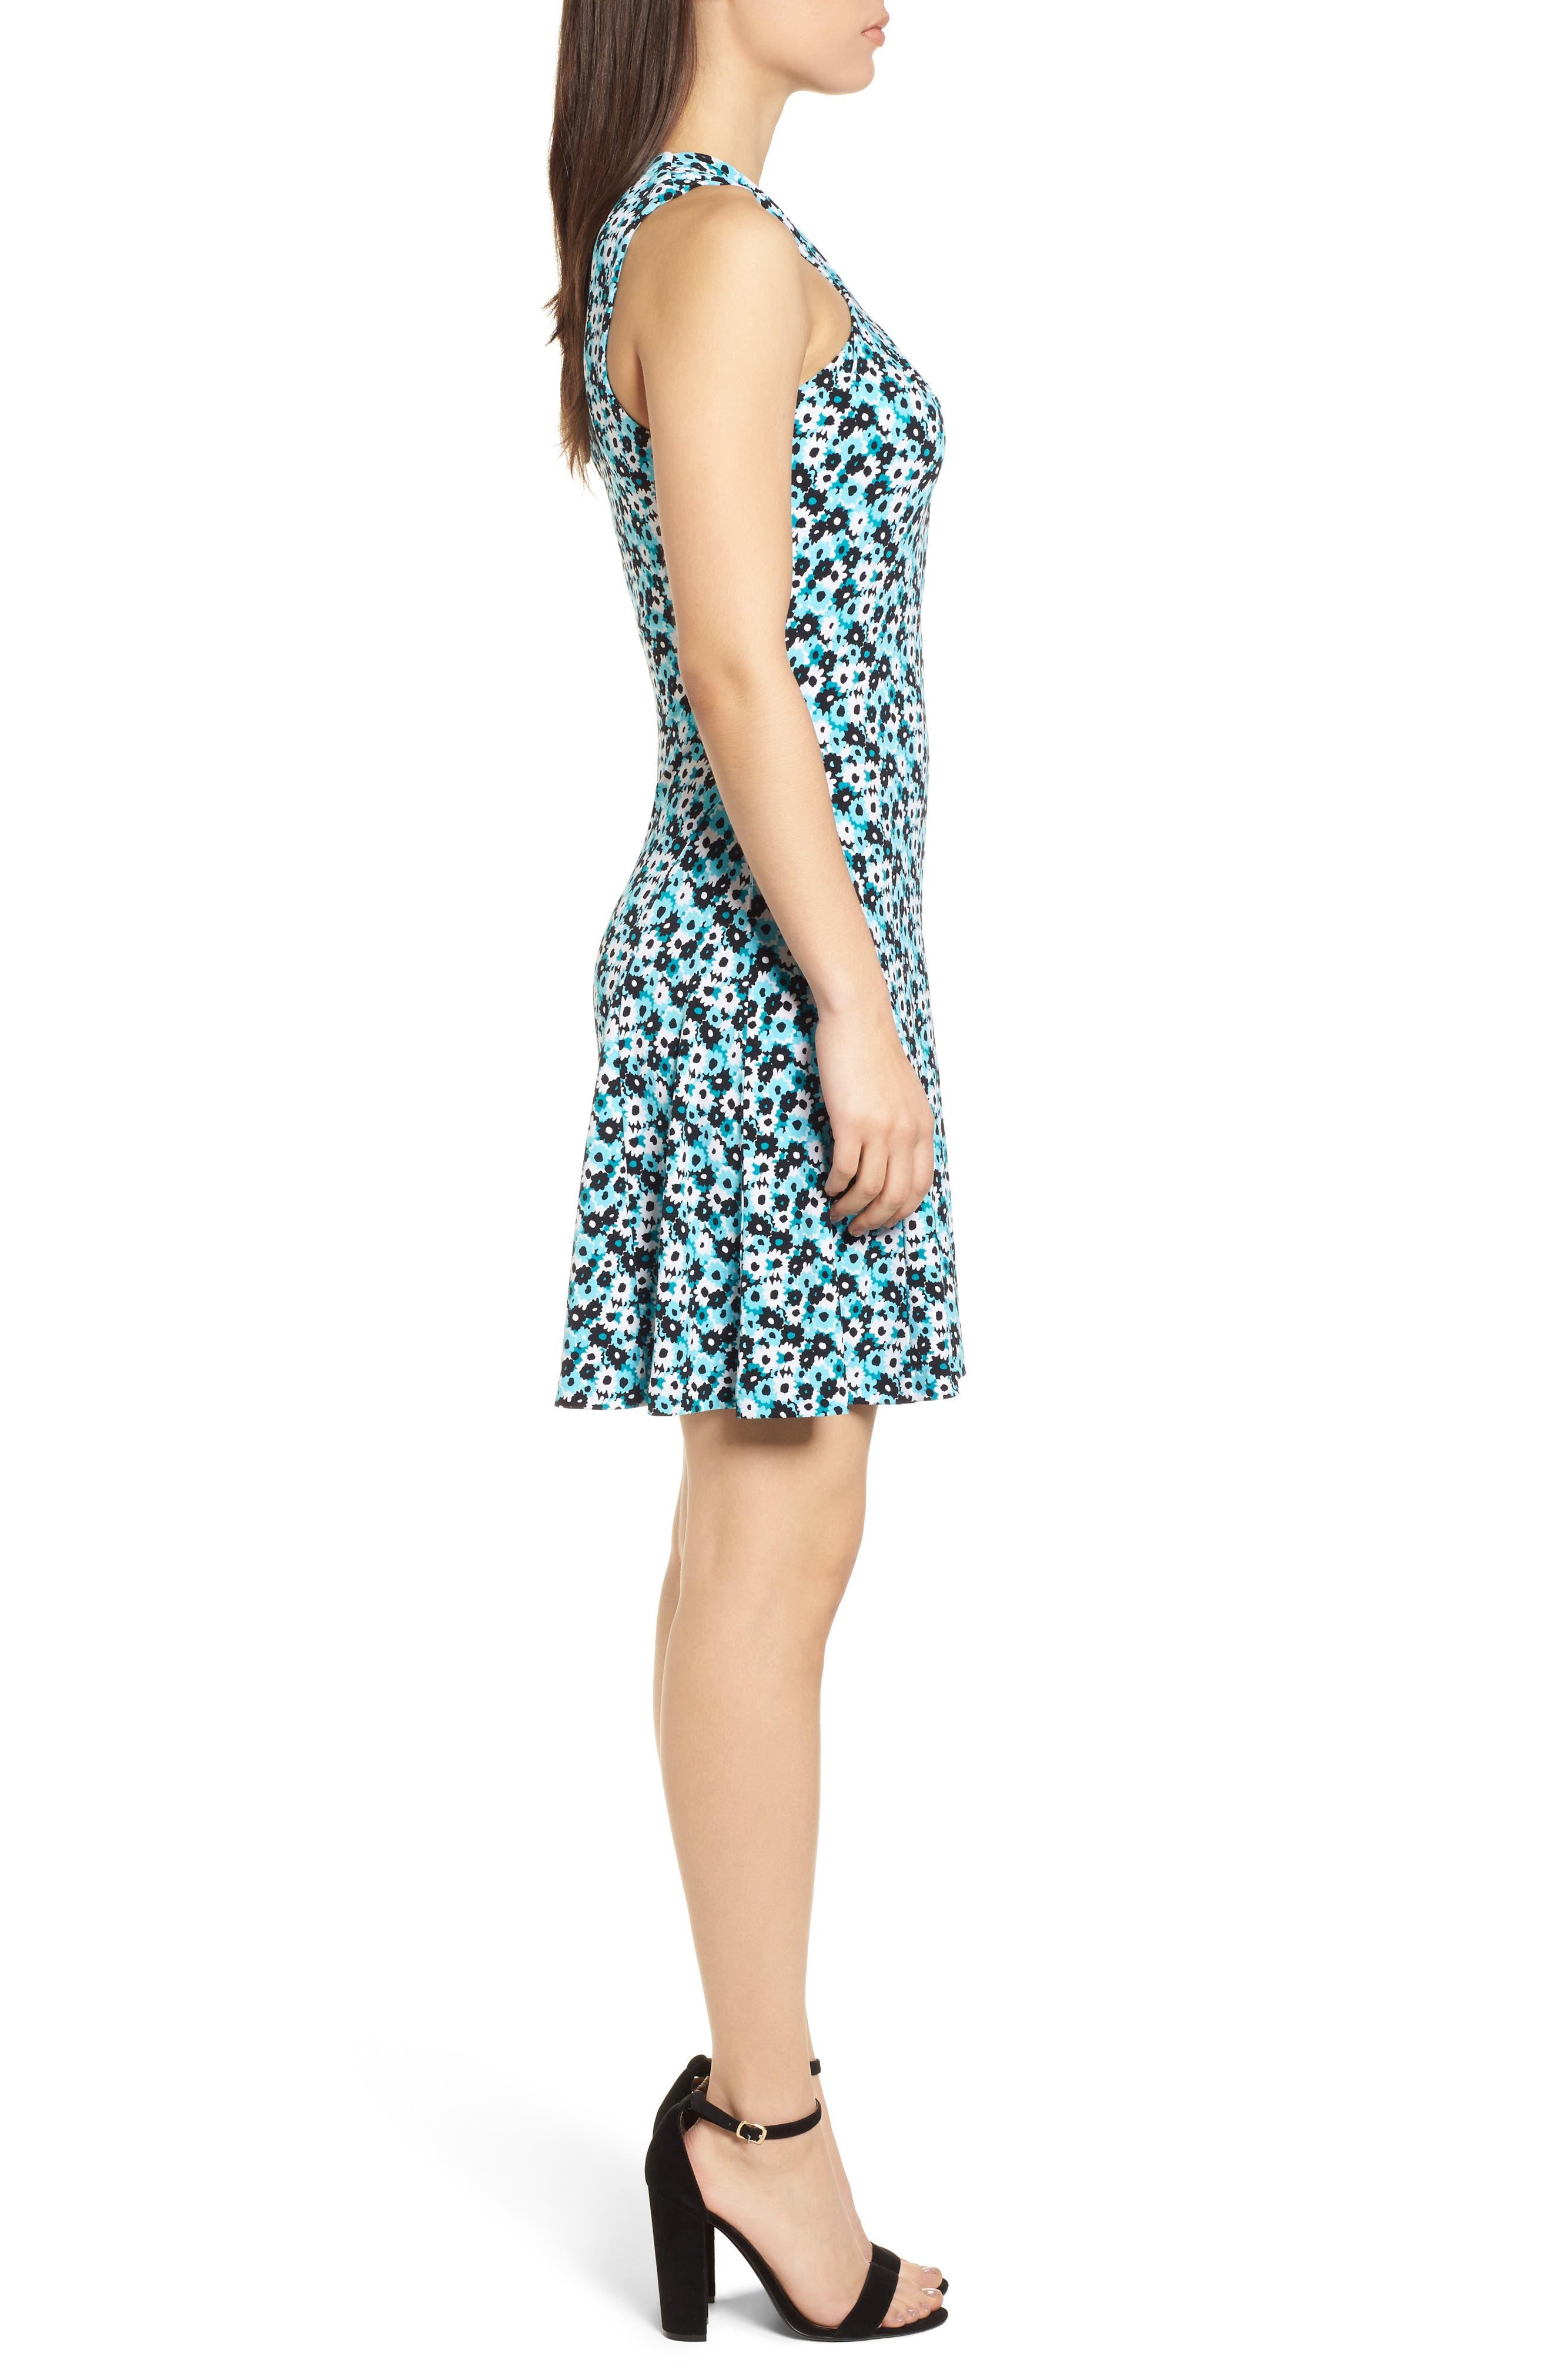 Carnations Cross Neck Fit and Flare Dress,                             Alternate thumbnail 3, color,                             Tile Blue/ Black Multi